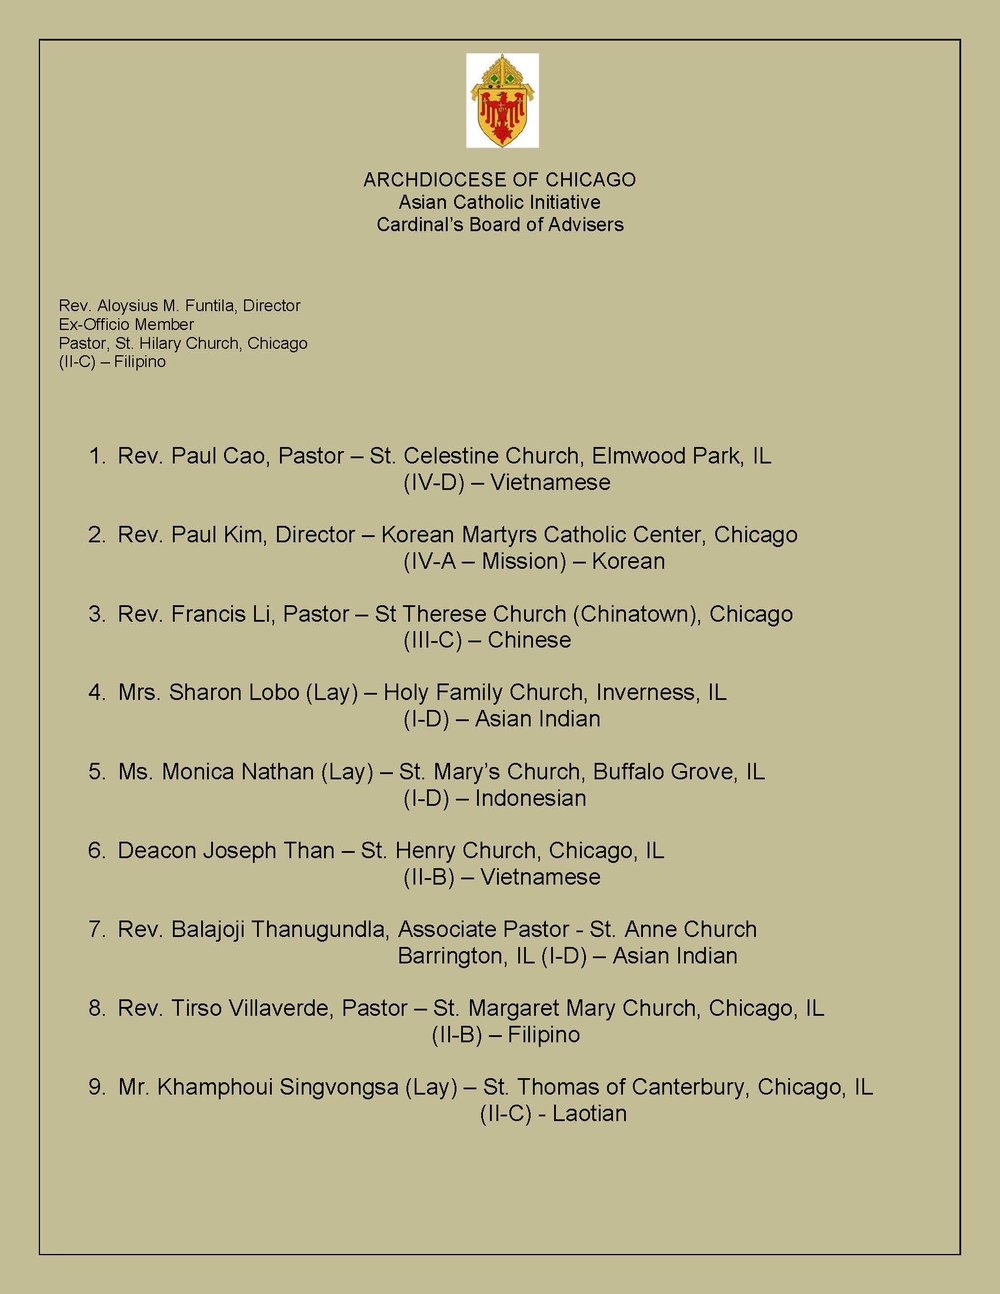 ACI - Board of Advisers.jpg